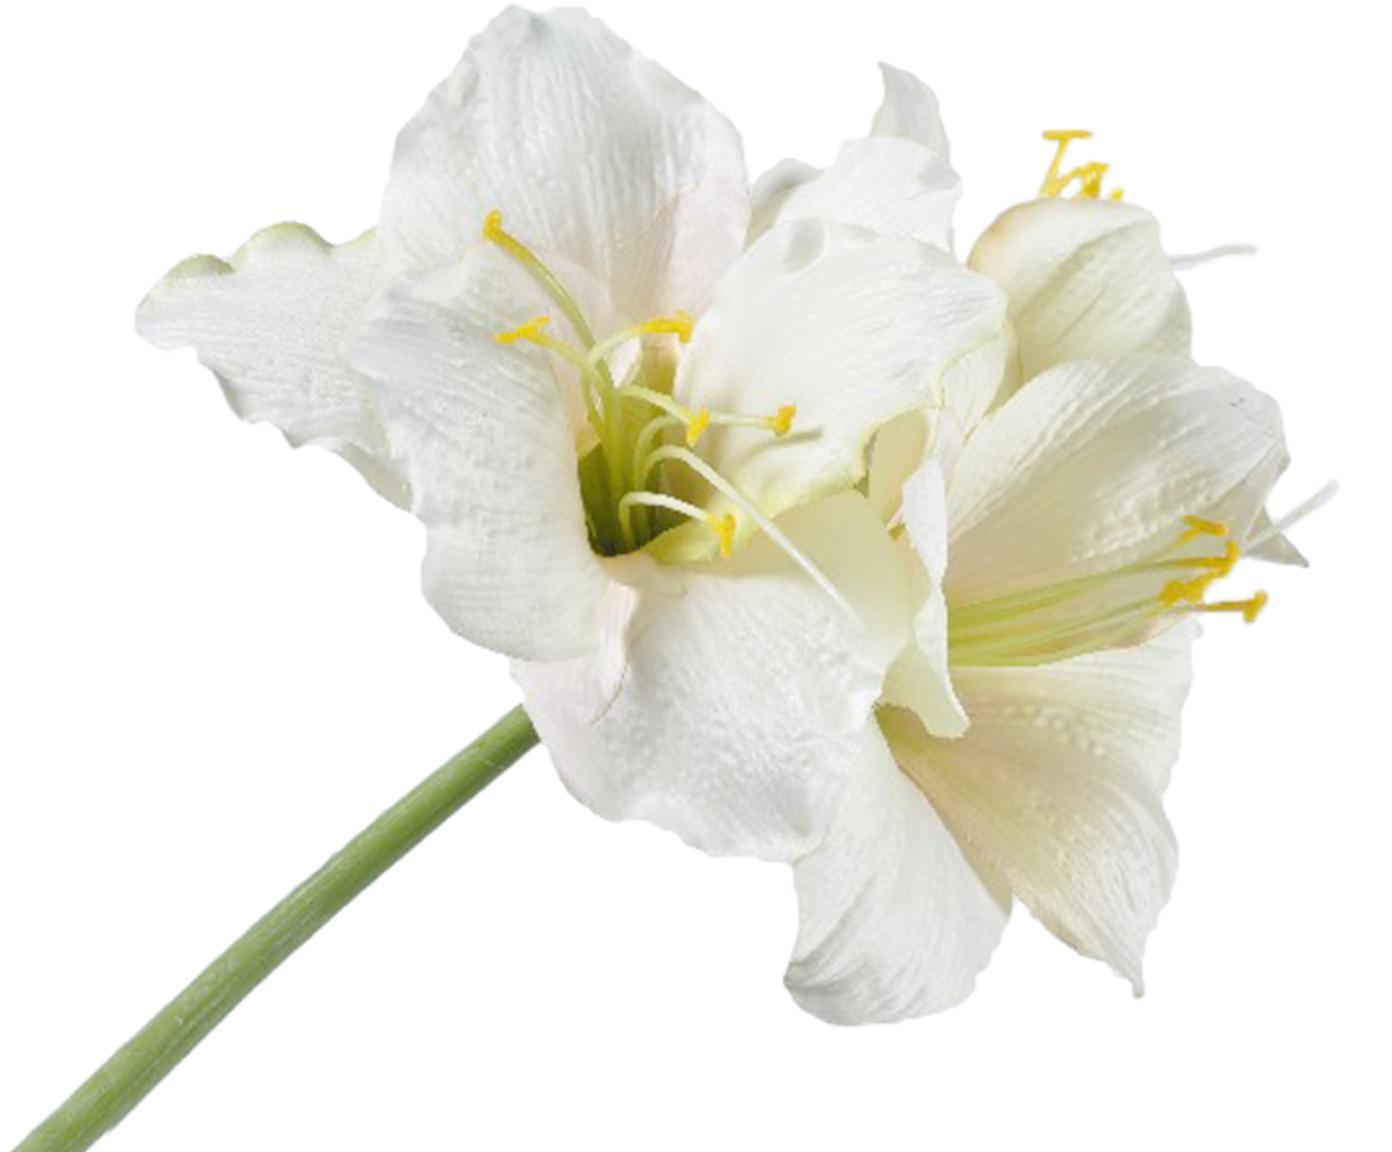 Flor artificial amaryllis Maryla, Poliéster, plástico, metal, Blanco, amarillo, verde, L 54 cm